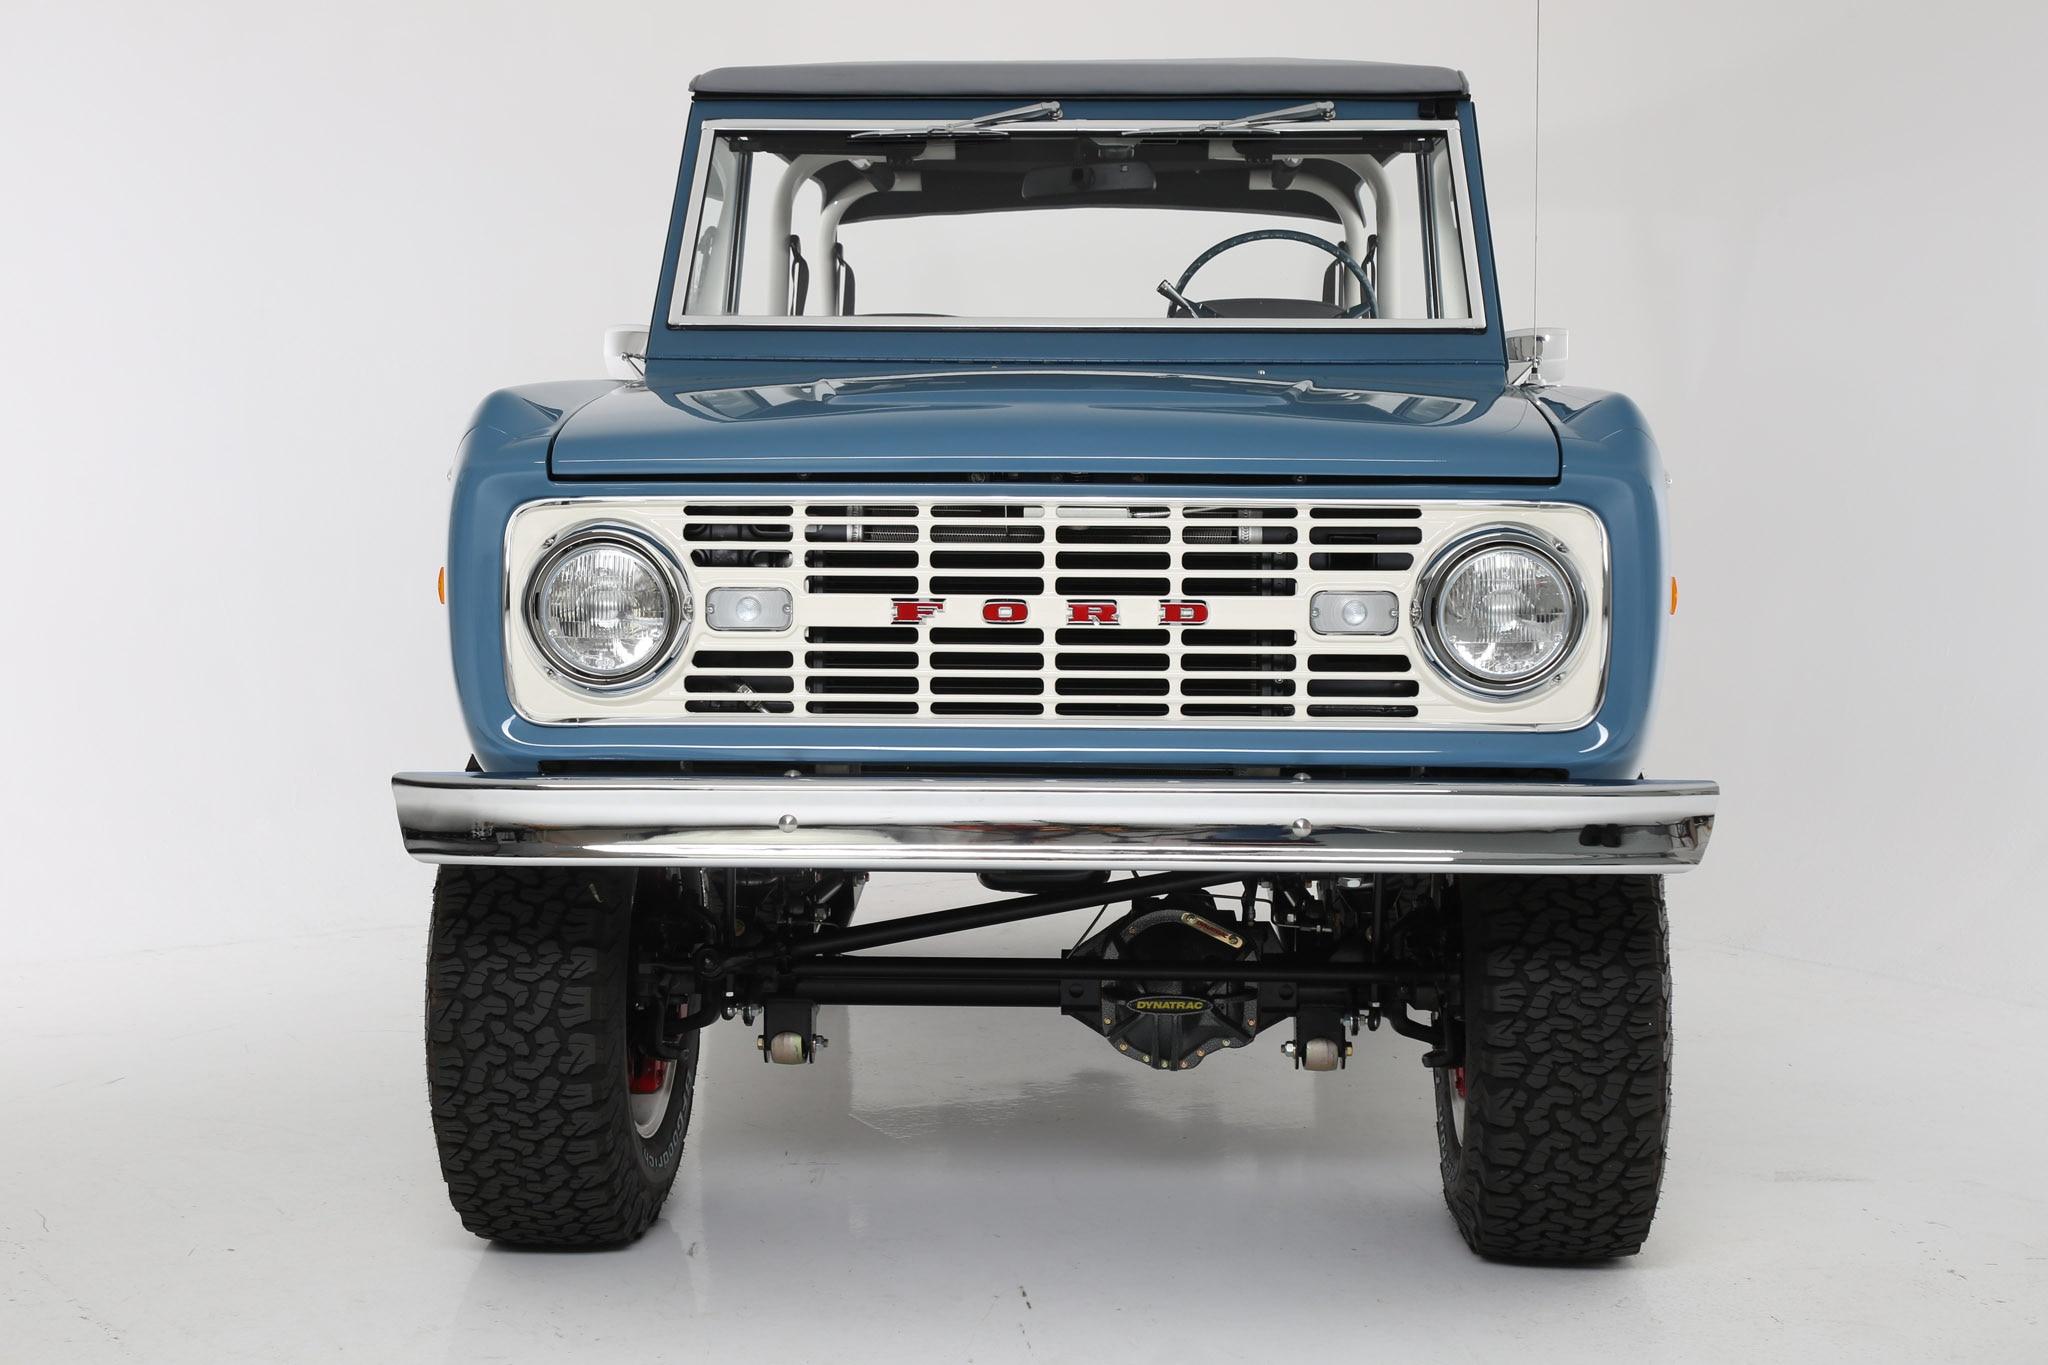 Icon Launches Classic Bronco Old School Series | Automobile Magazine